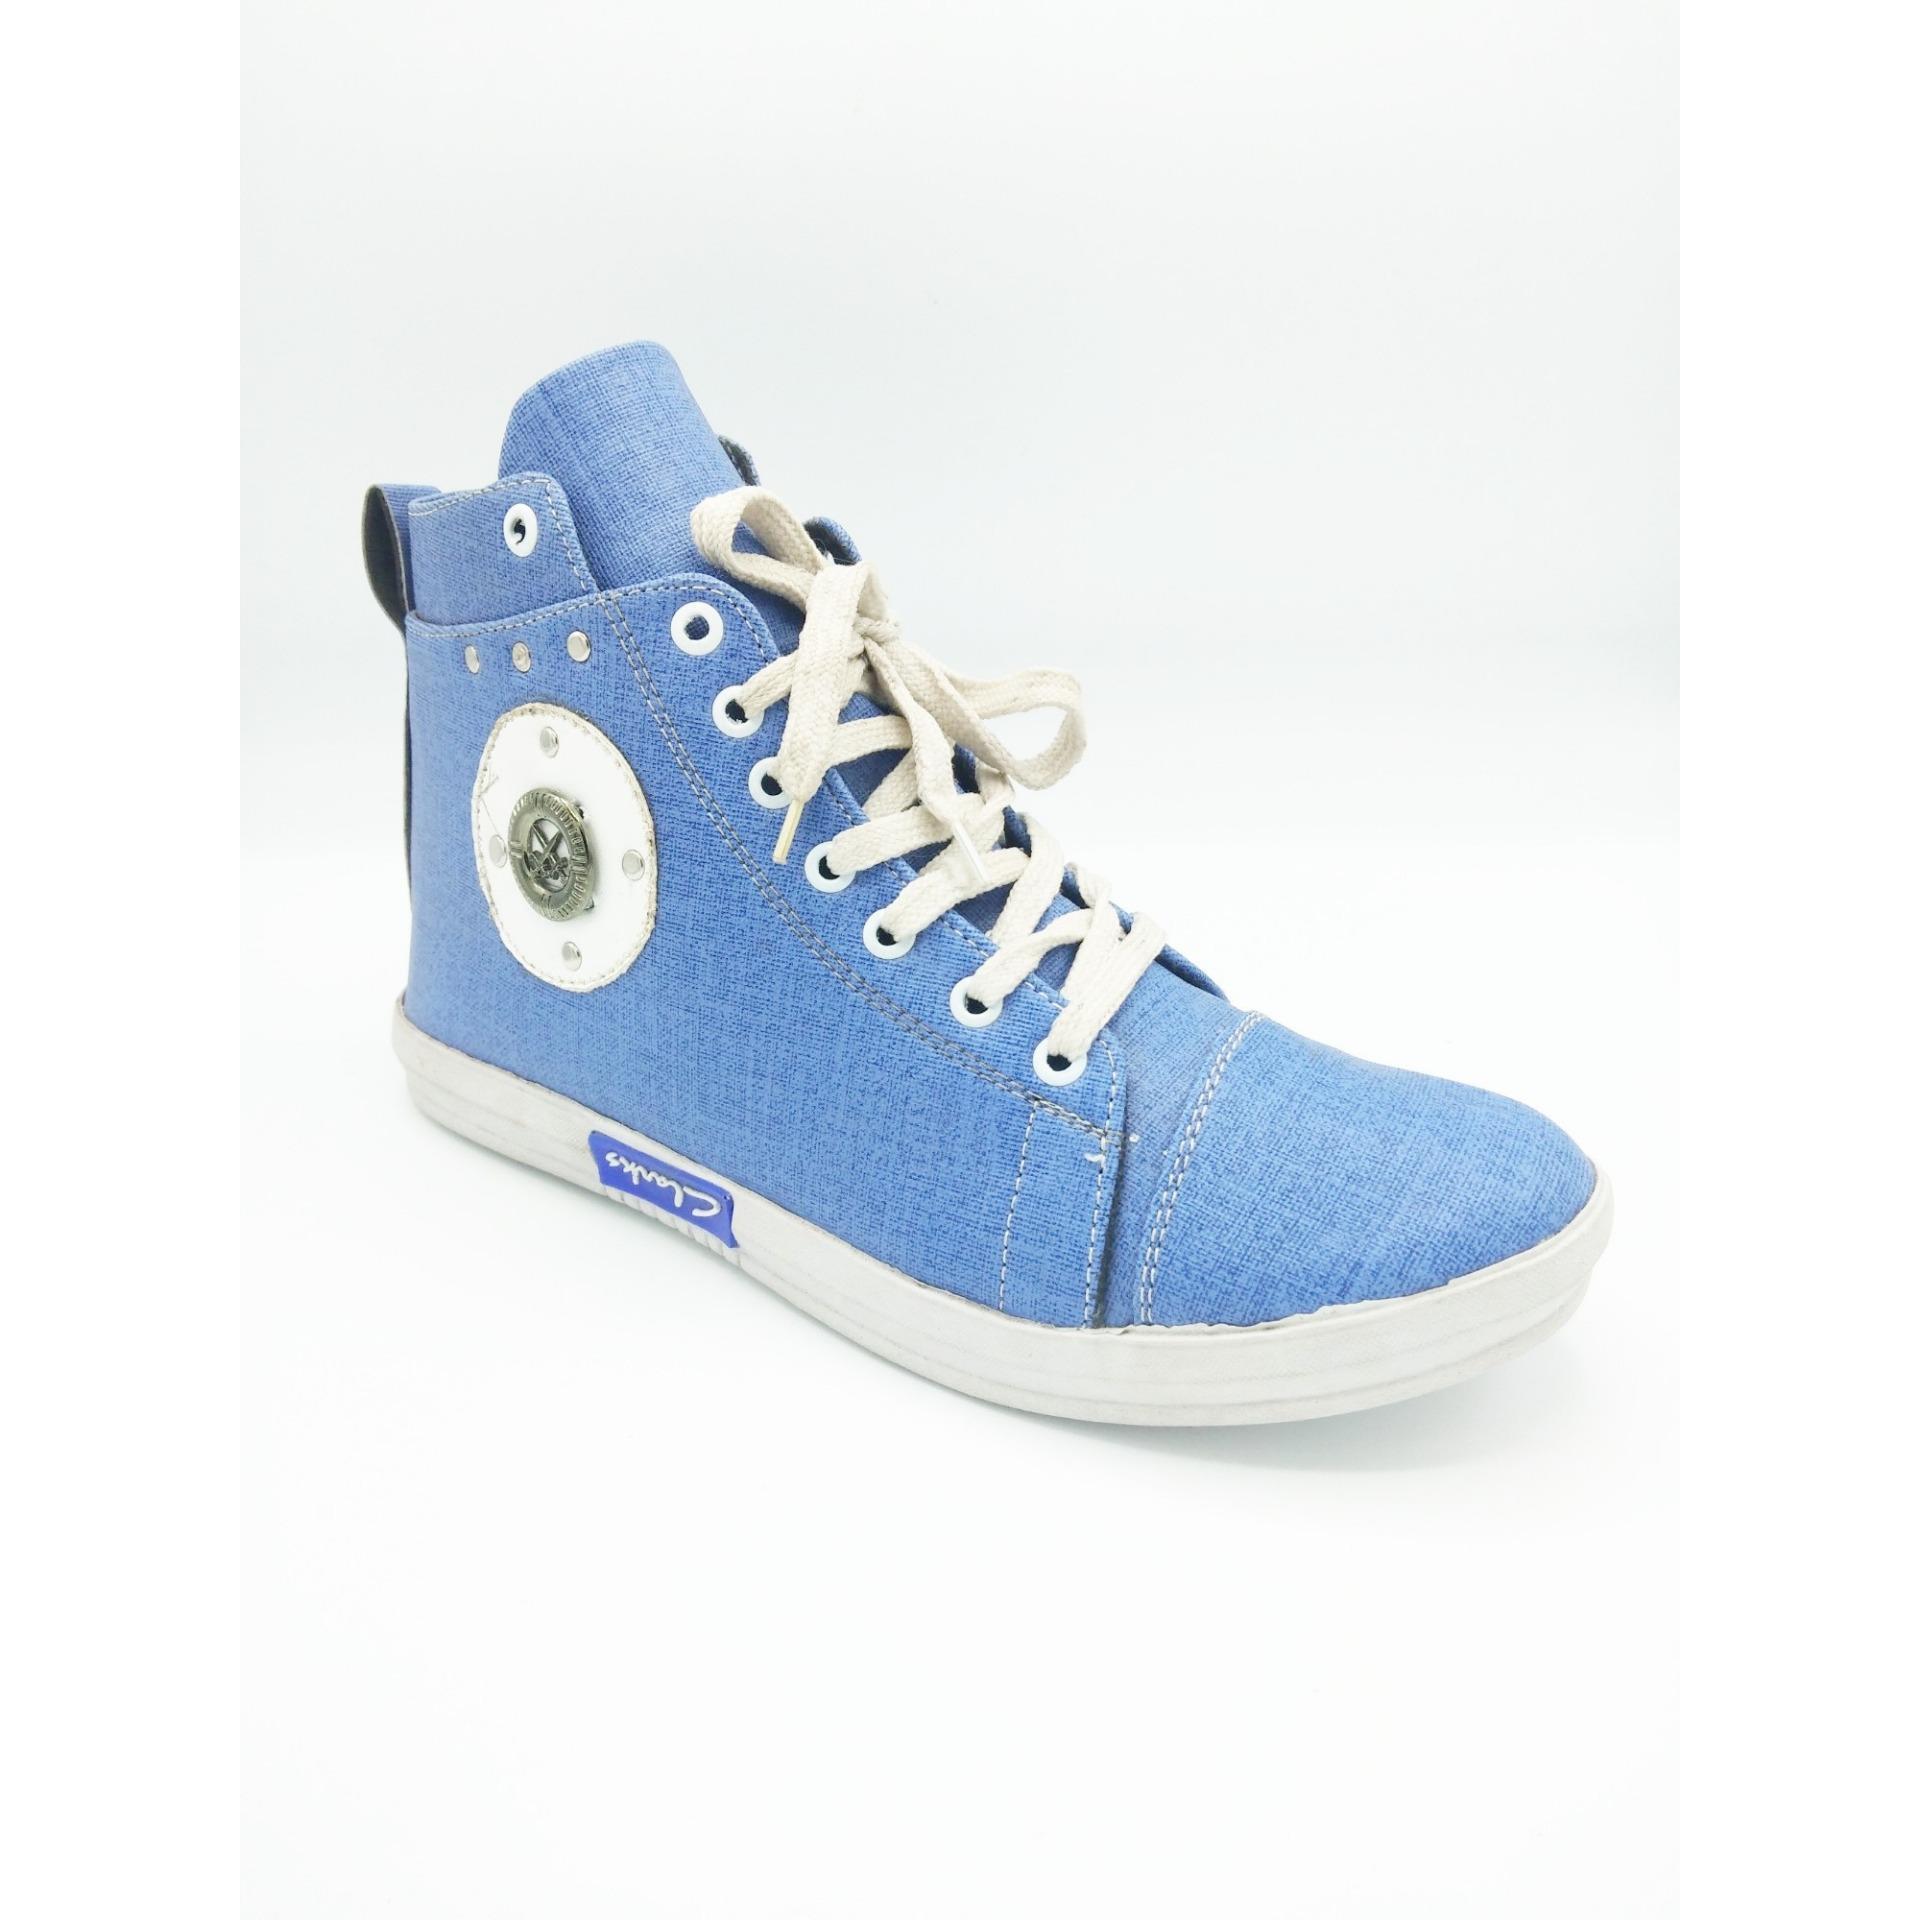 5773f3aead7 Women s Shoes - Buy Ladies Footwear Online - Daraz Pakistan